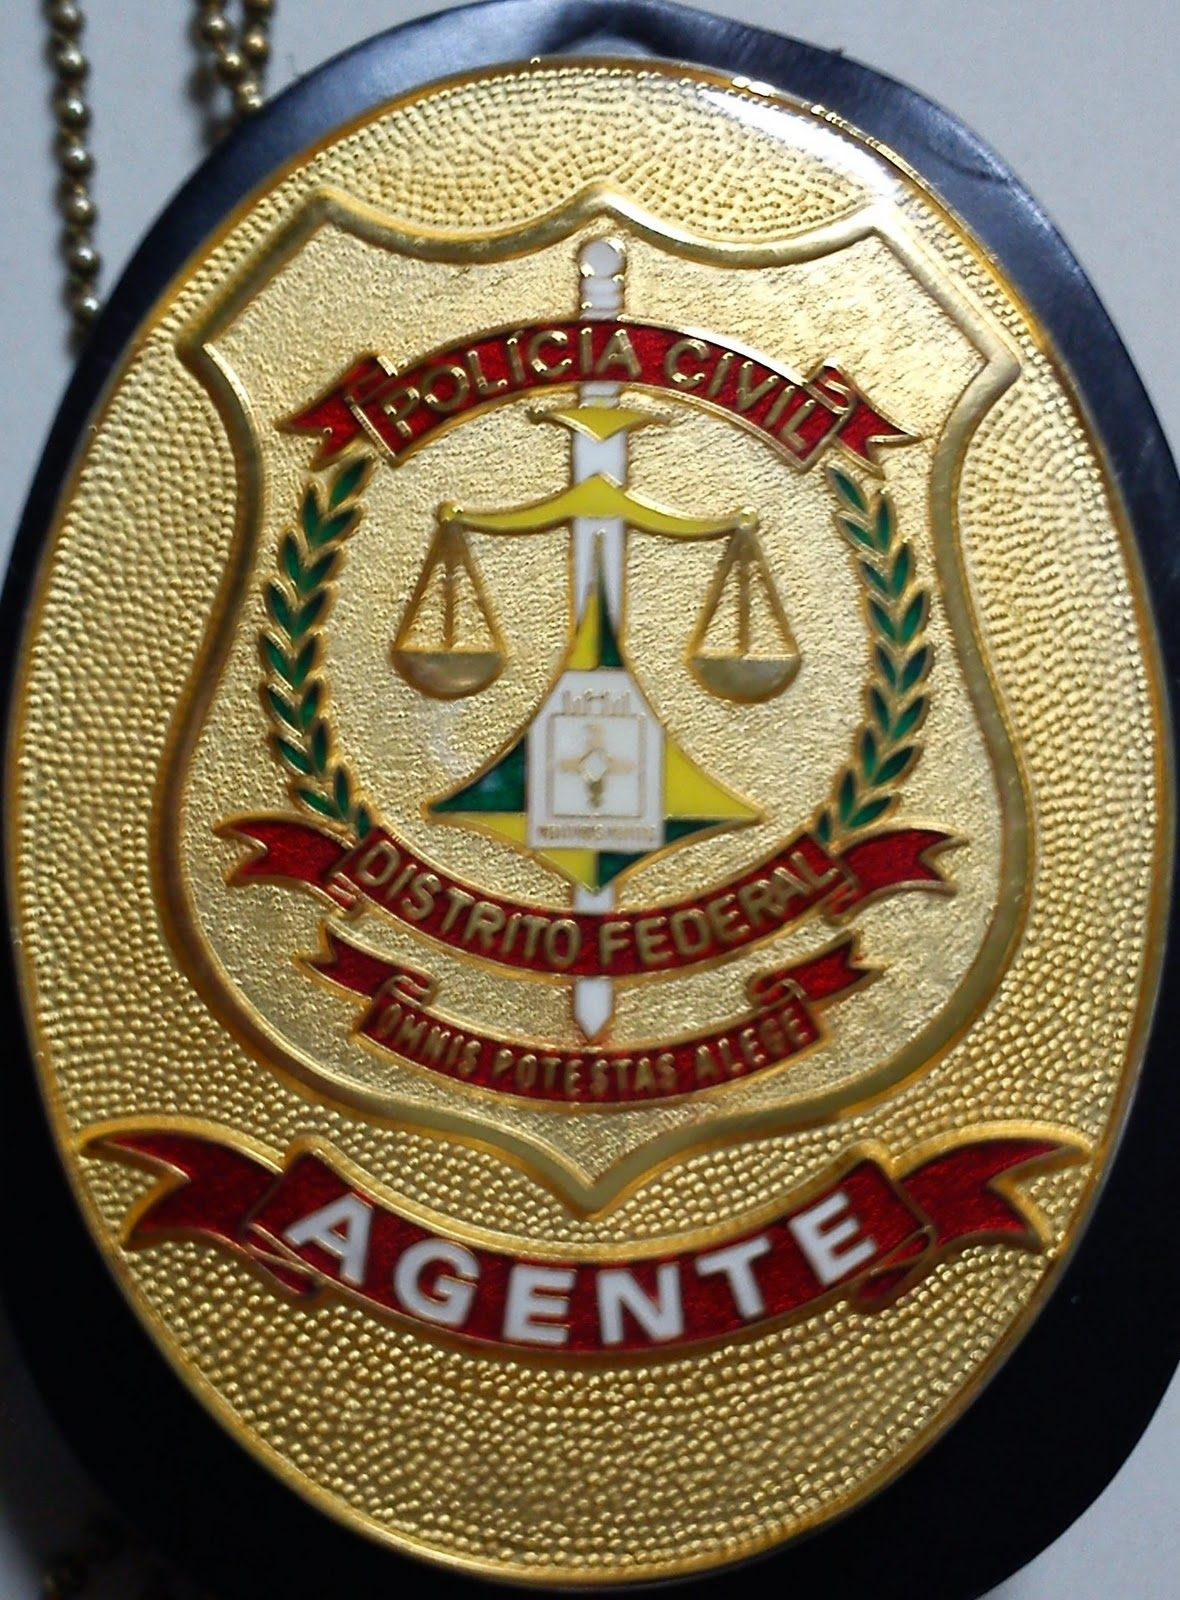 Police cap badges ga rel hat badges page 1 garel - Pol Cia Civil Distrigo Federal Google Police Badgeslaw Enforcementfederalbrazil